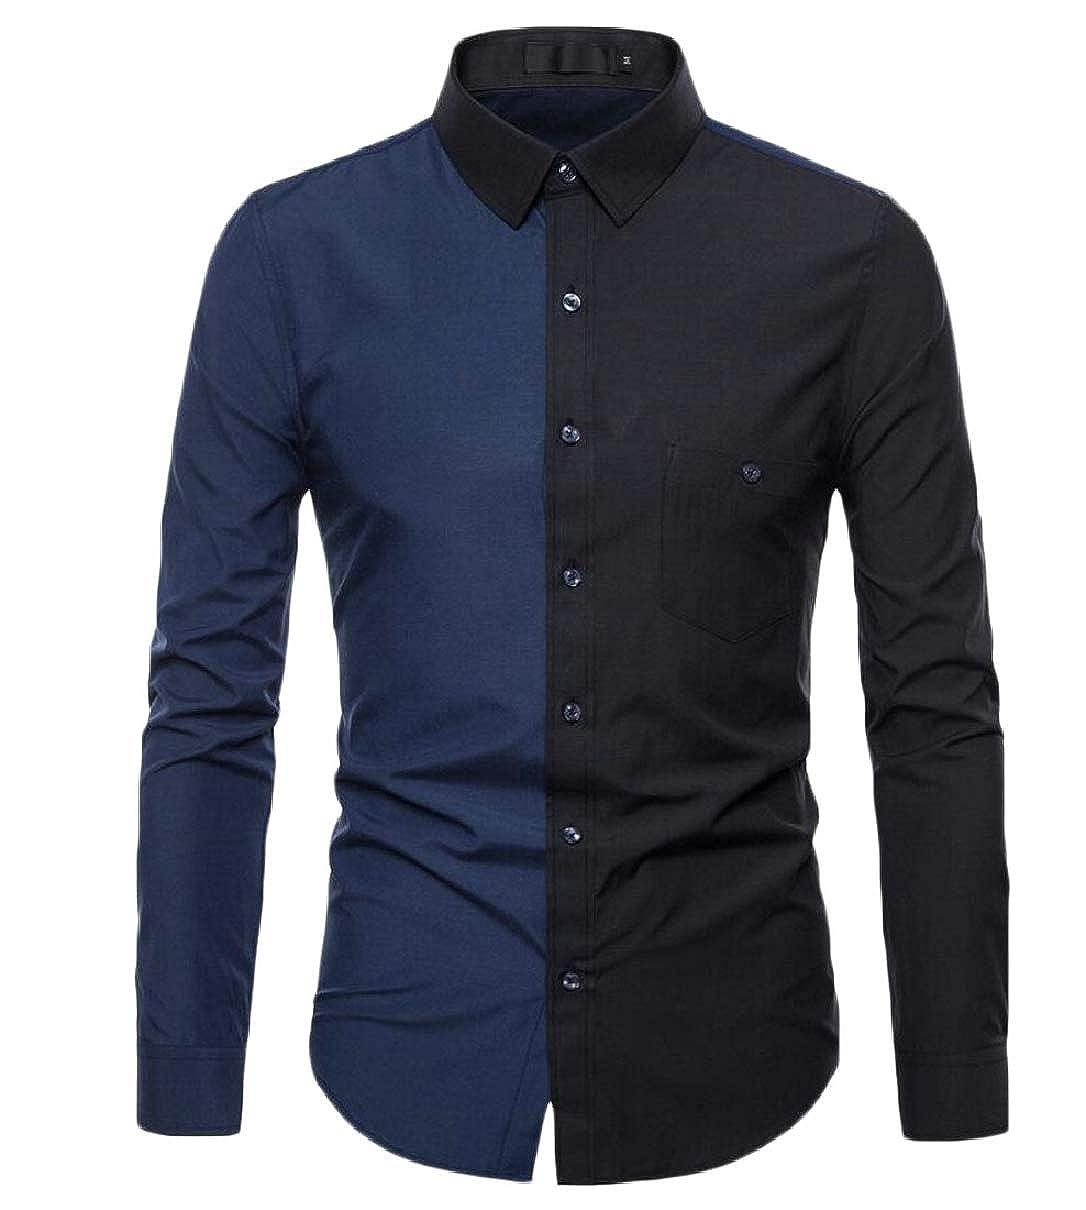 CBTLVSN Mens Slim Long Sleeve Button Down Shirt Contrast Color Button Up Shirts